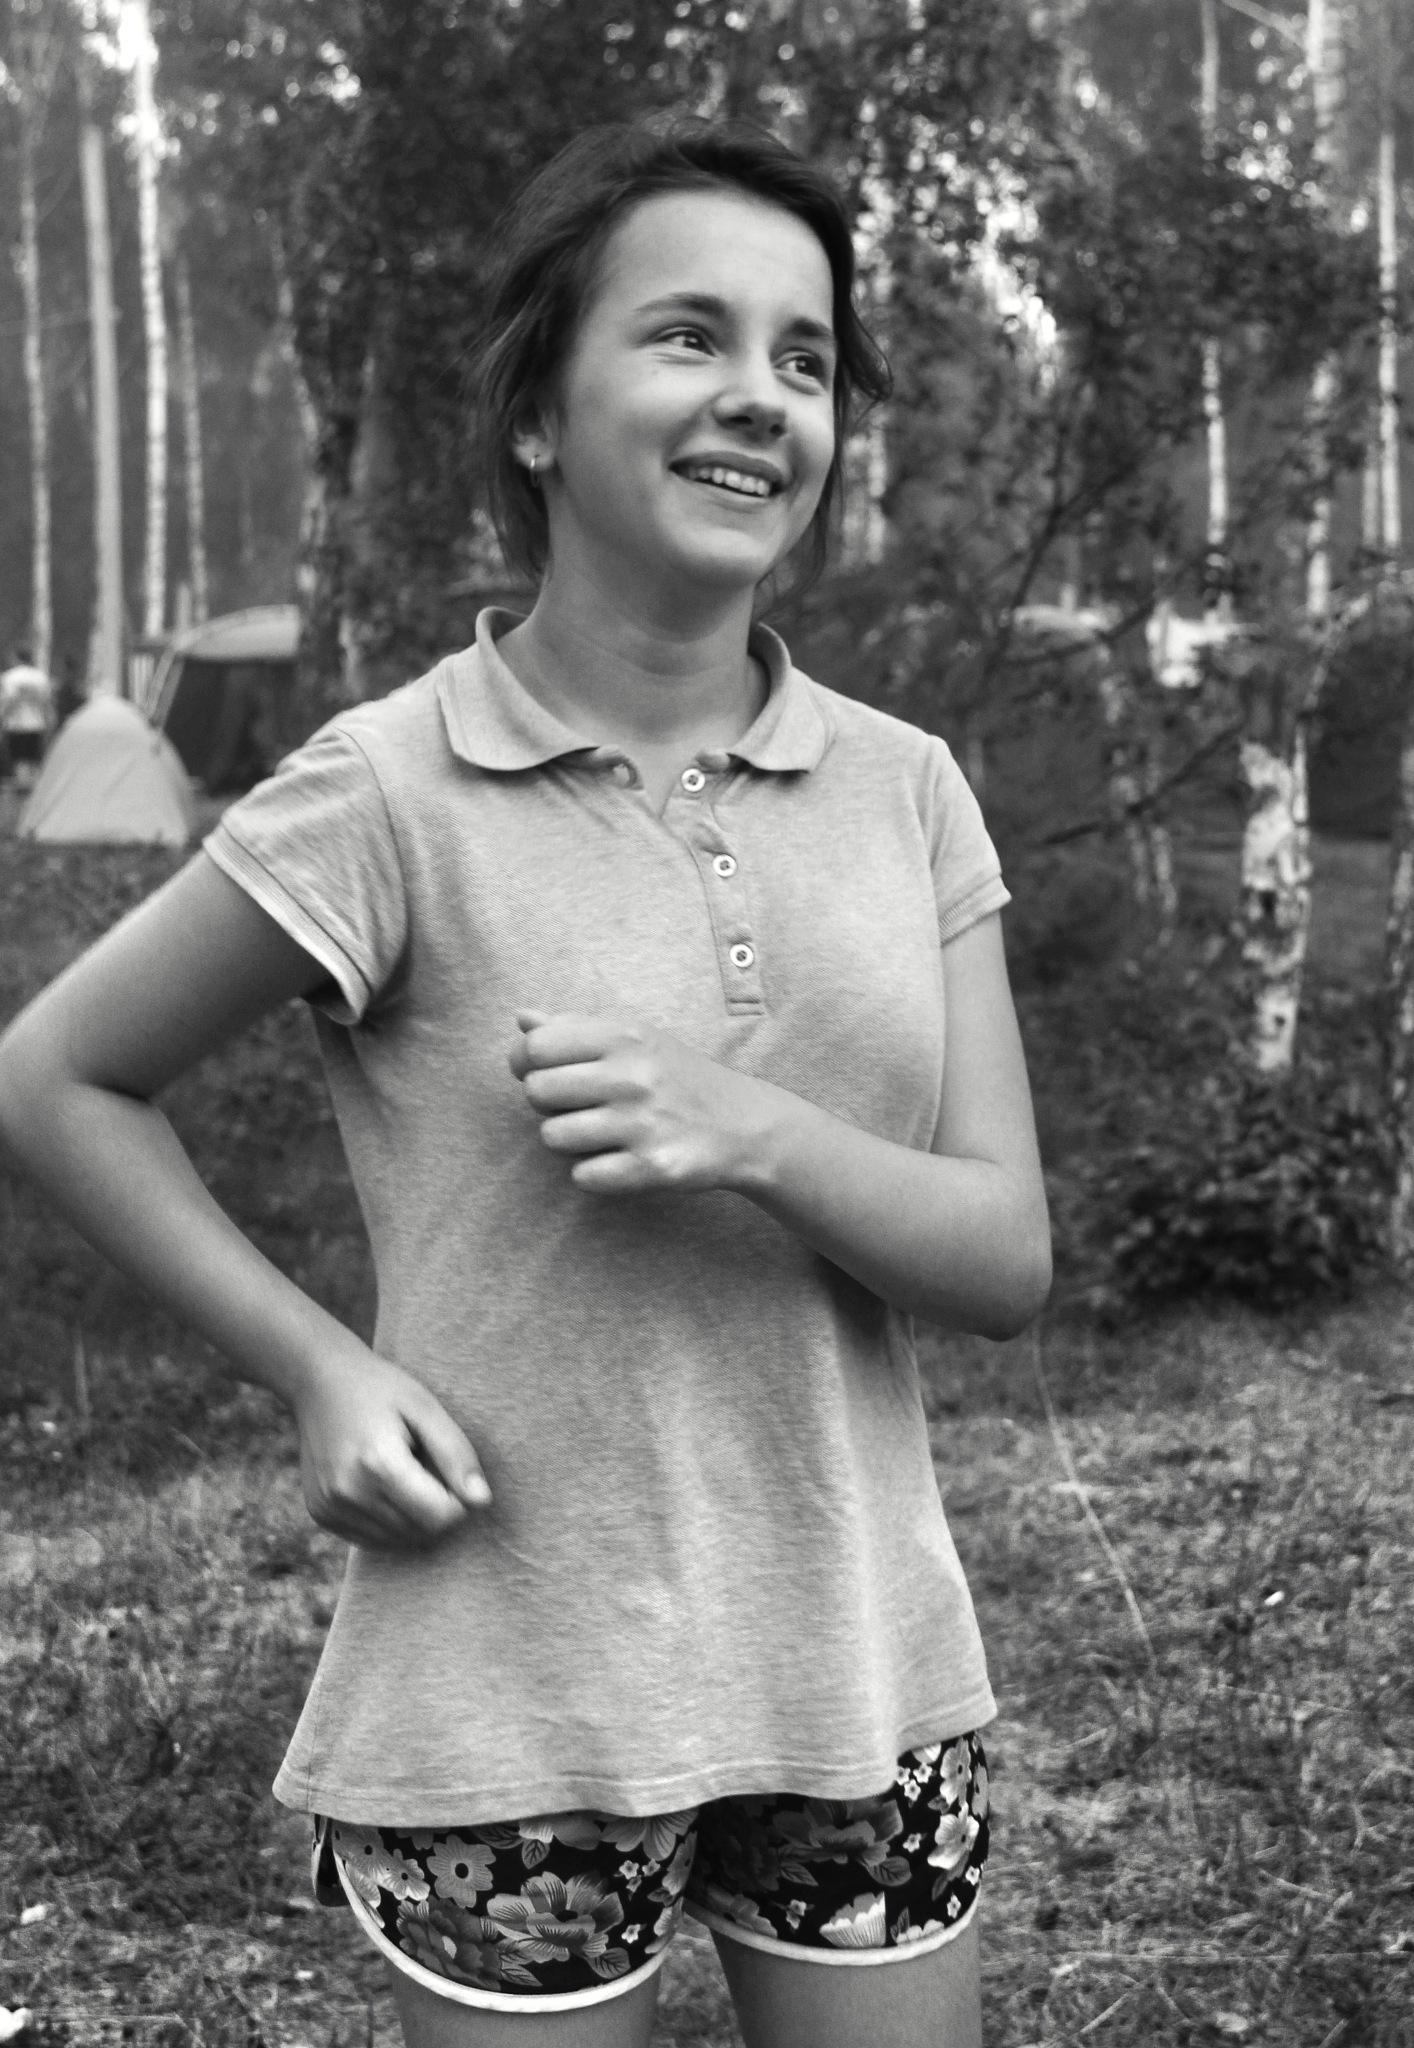 Dancing in the forest by Сергей Юрьев